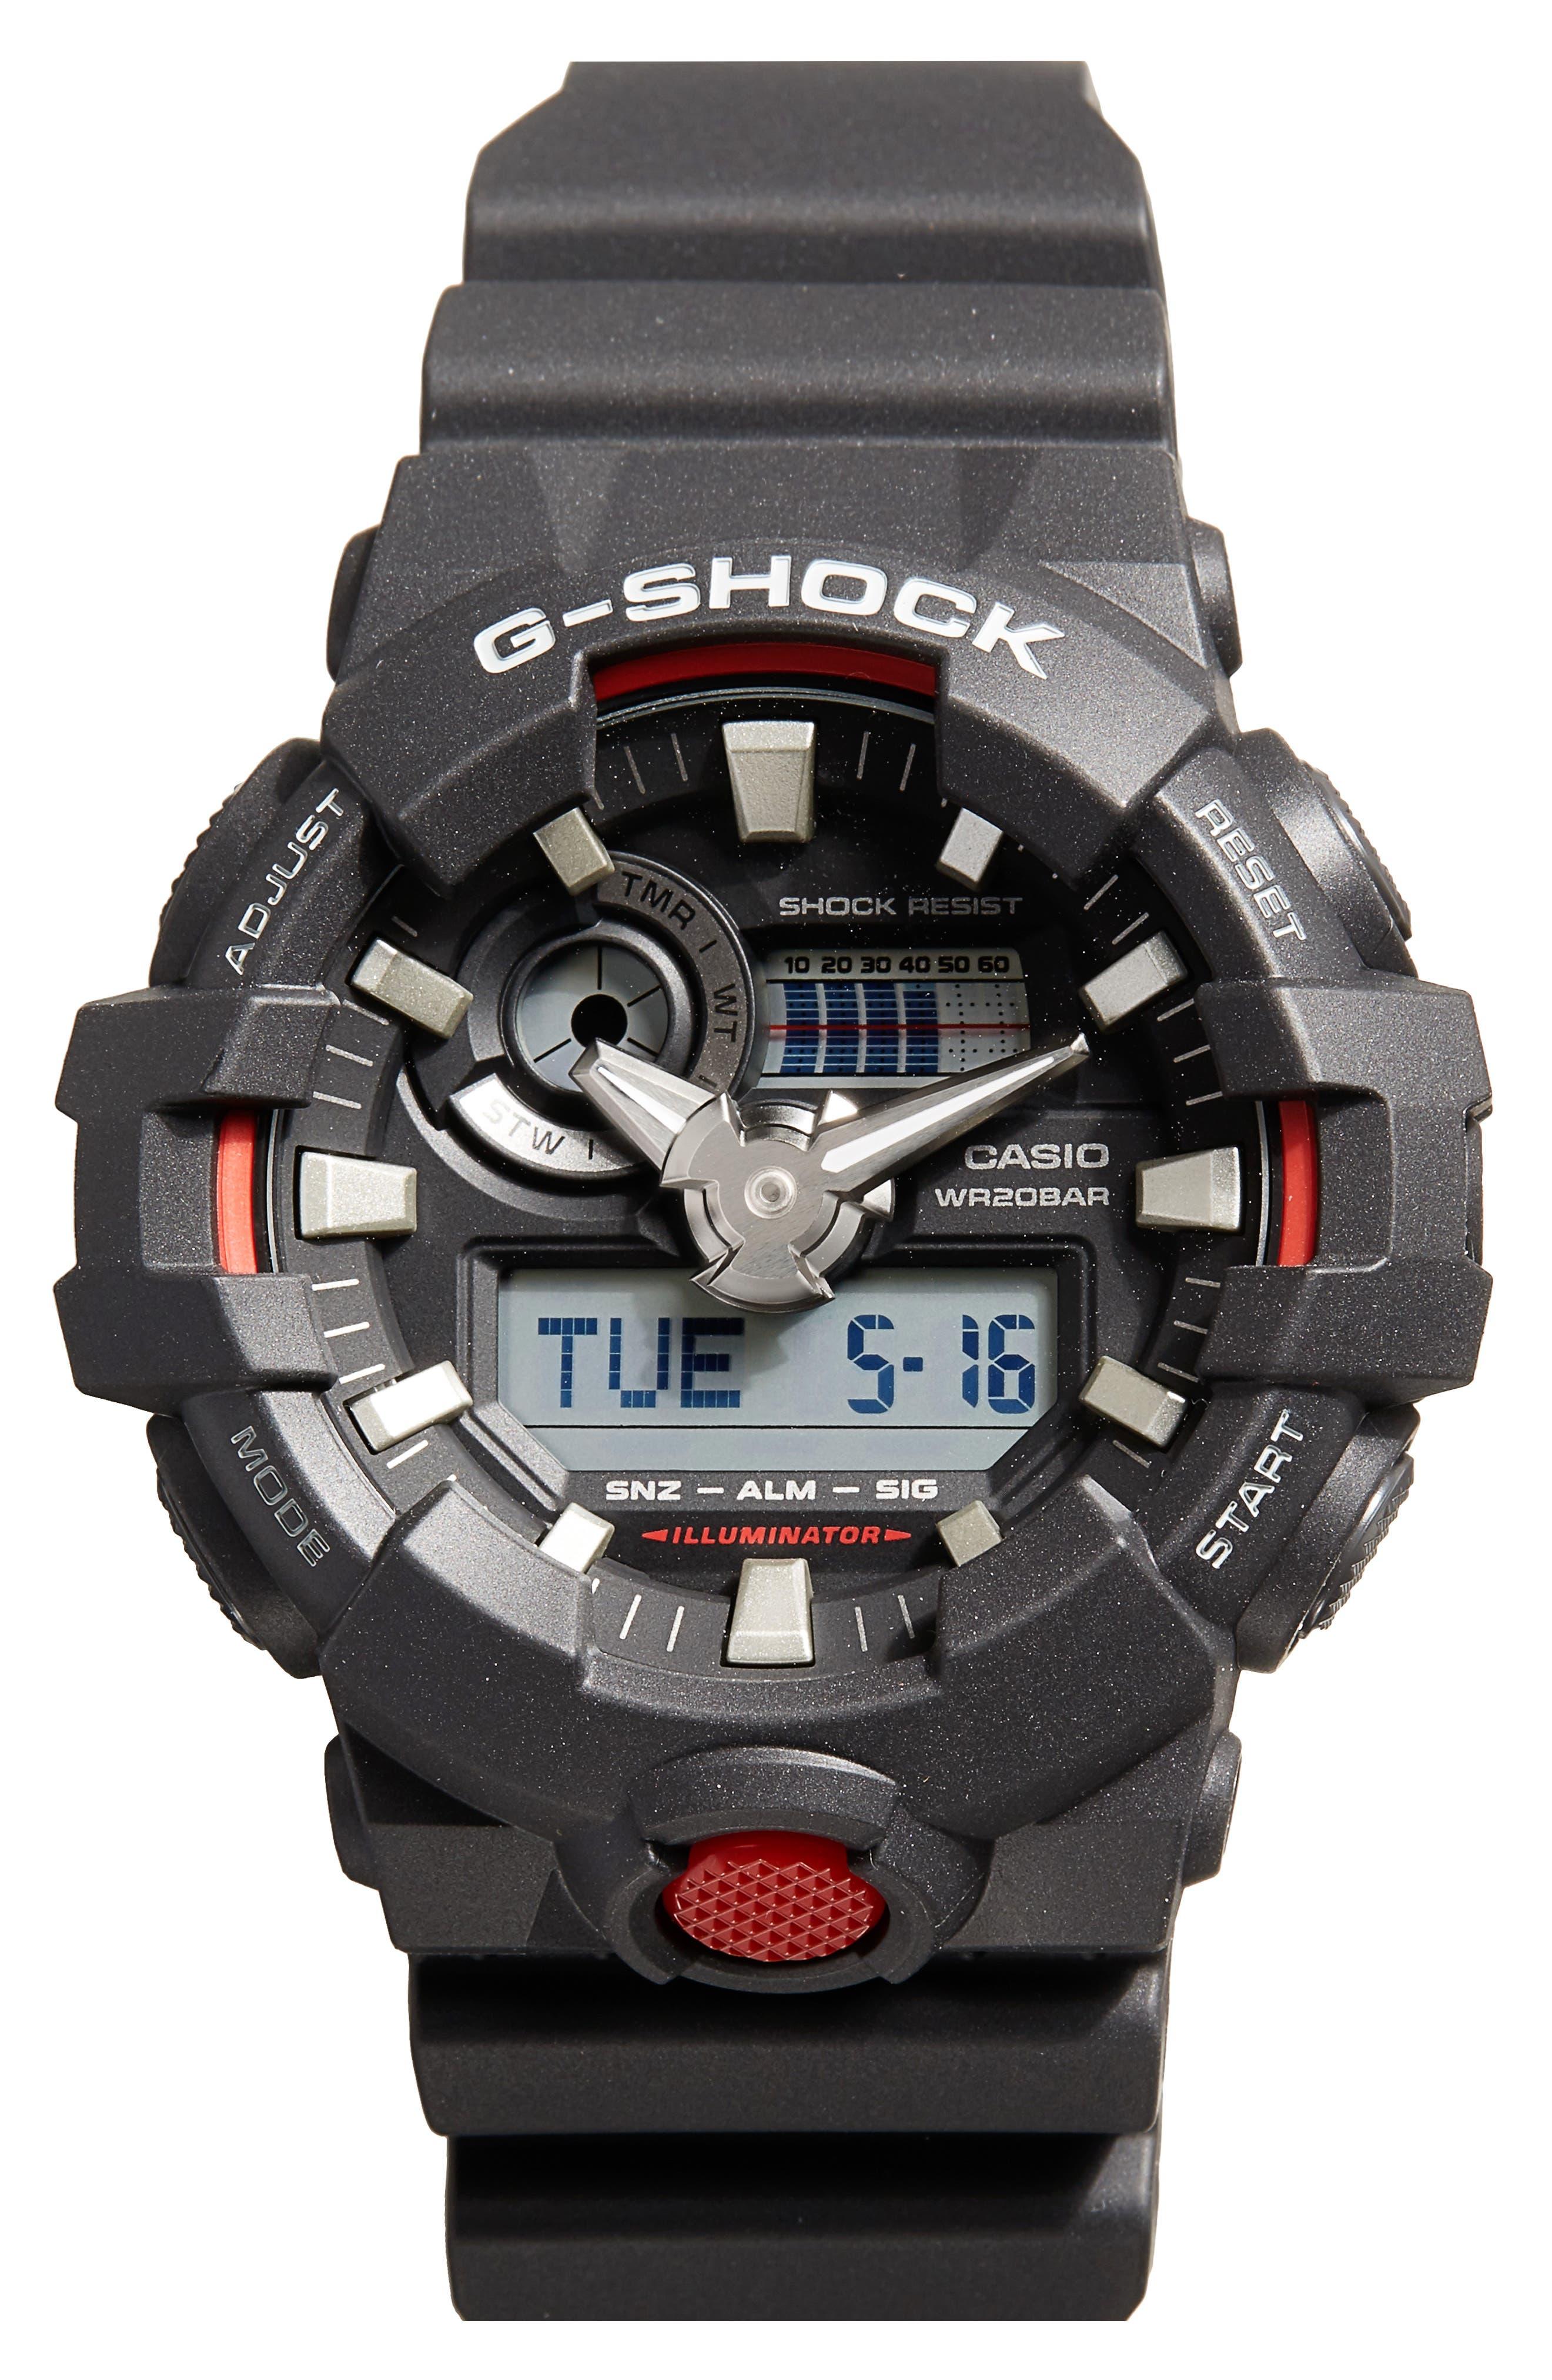 G-SHOCK BABY-G G-Shock GA700 Ana-Digi Watch Set, 55mm